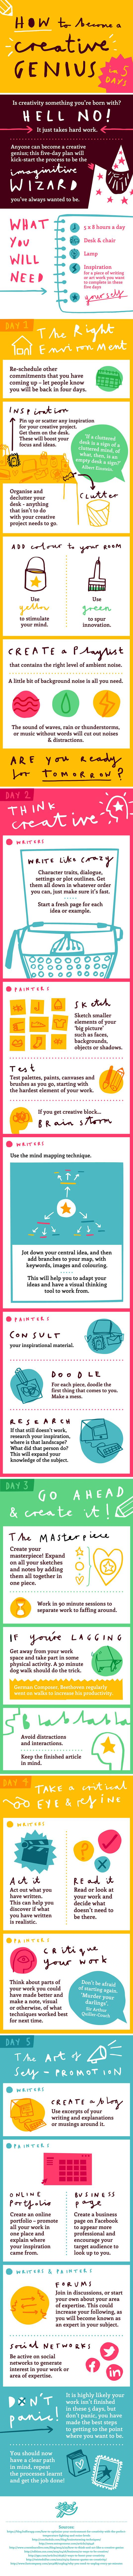 Creative genius infographic